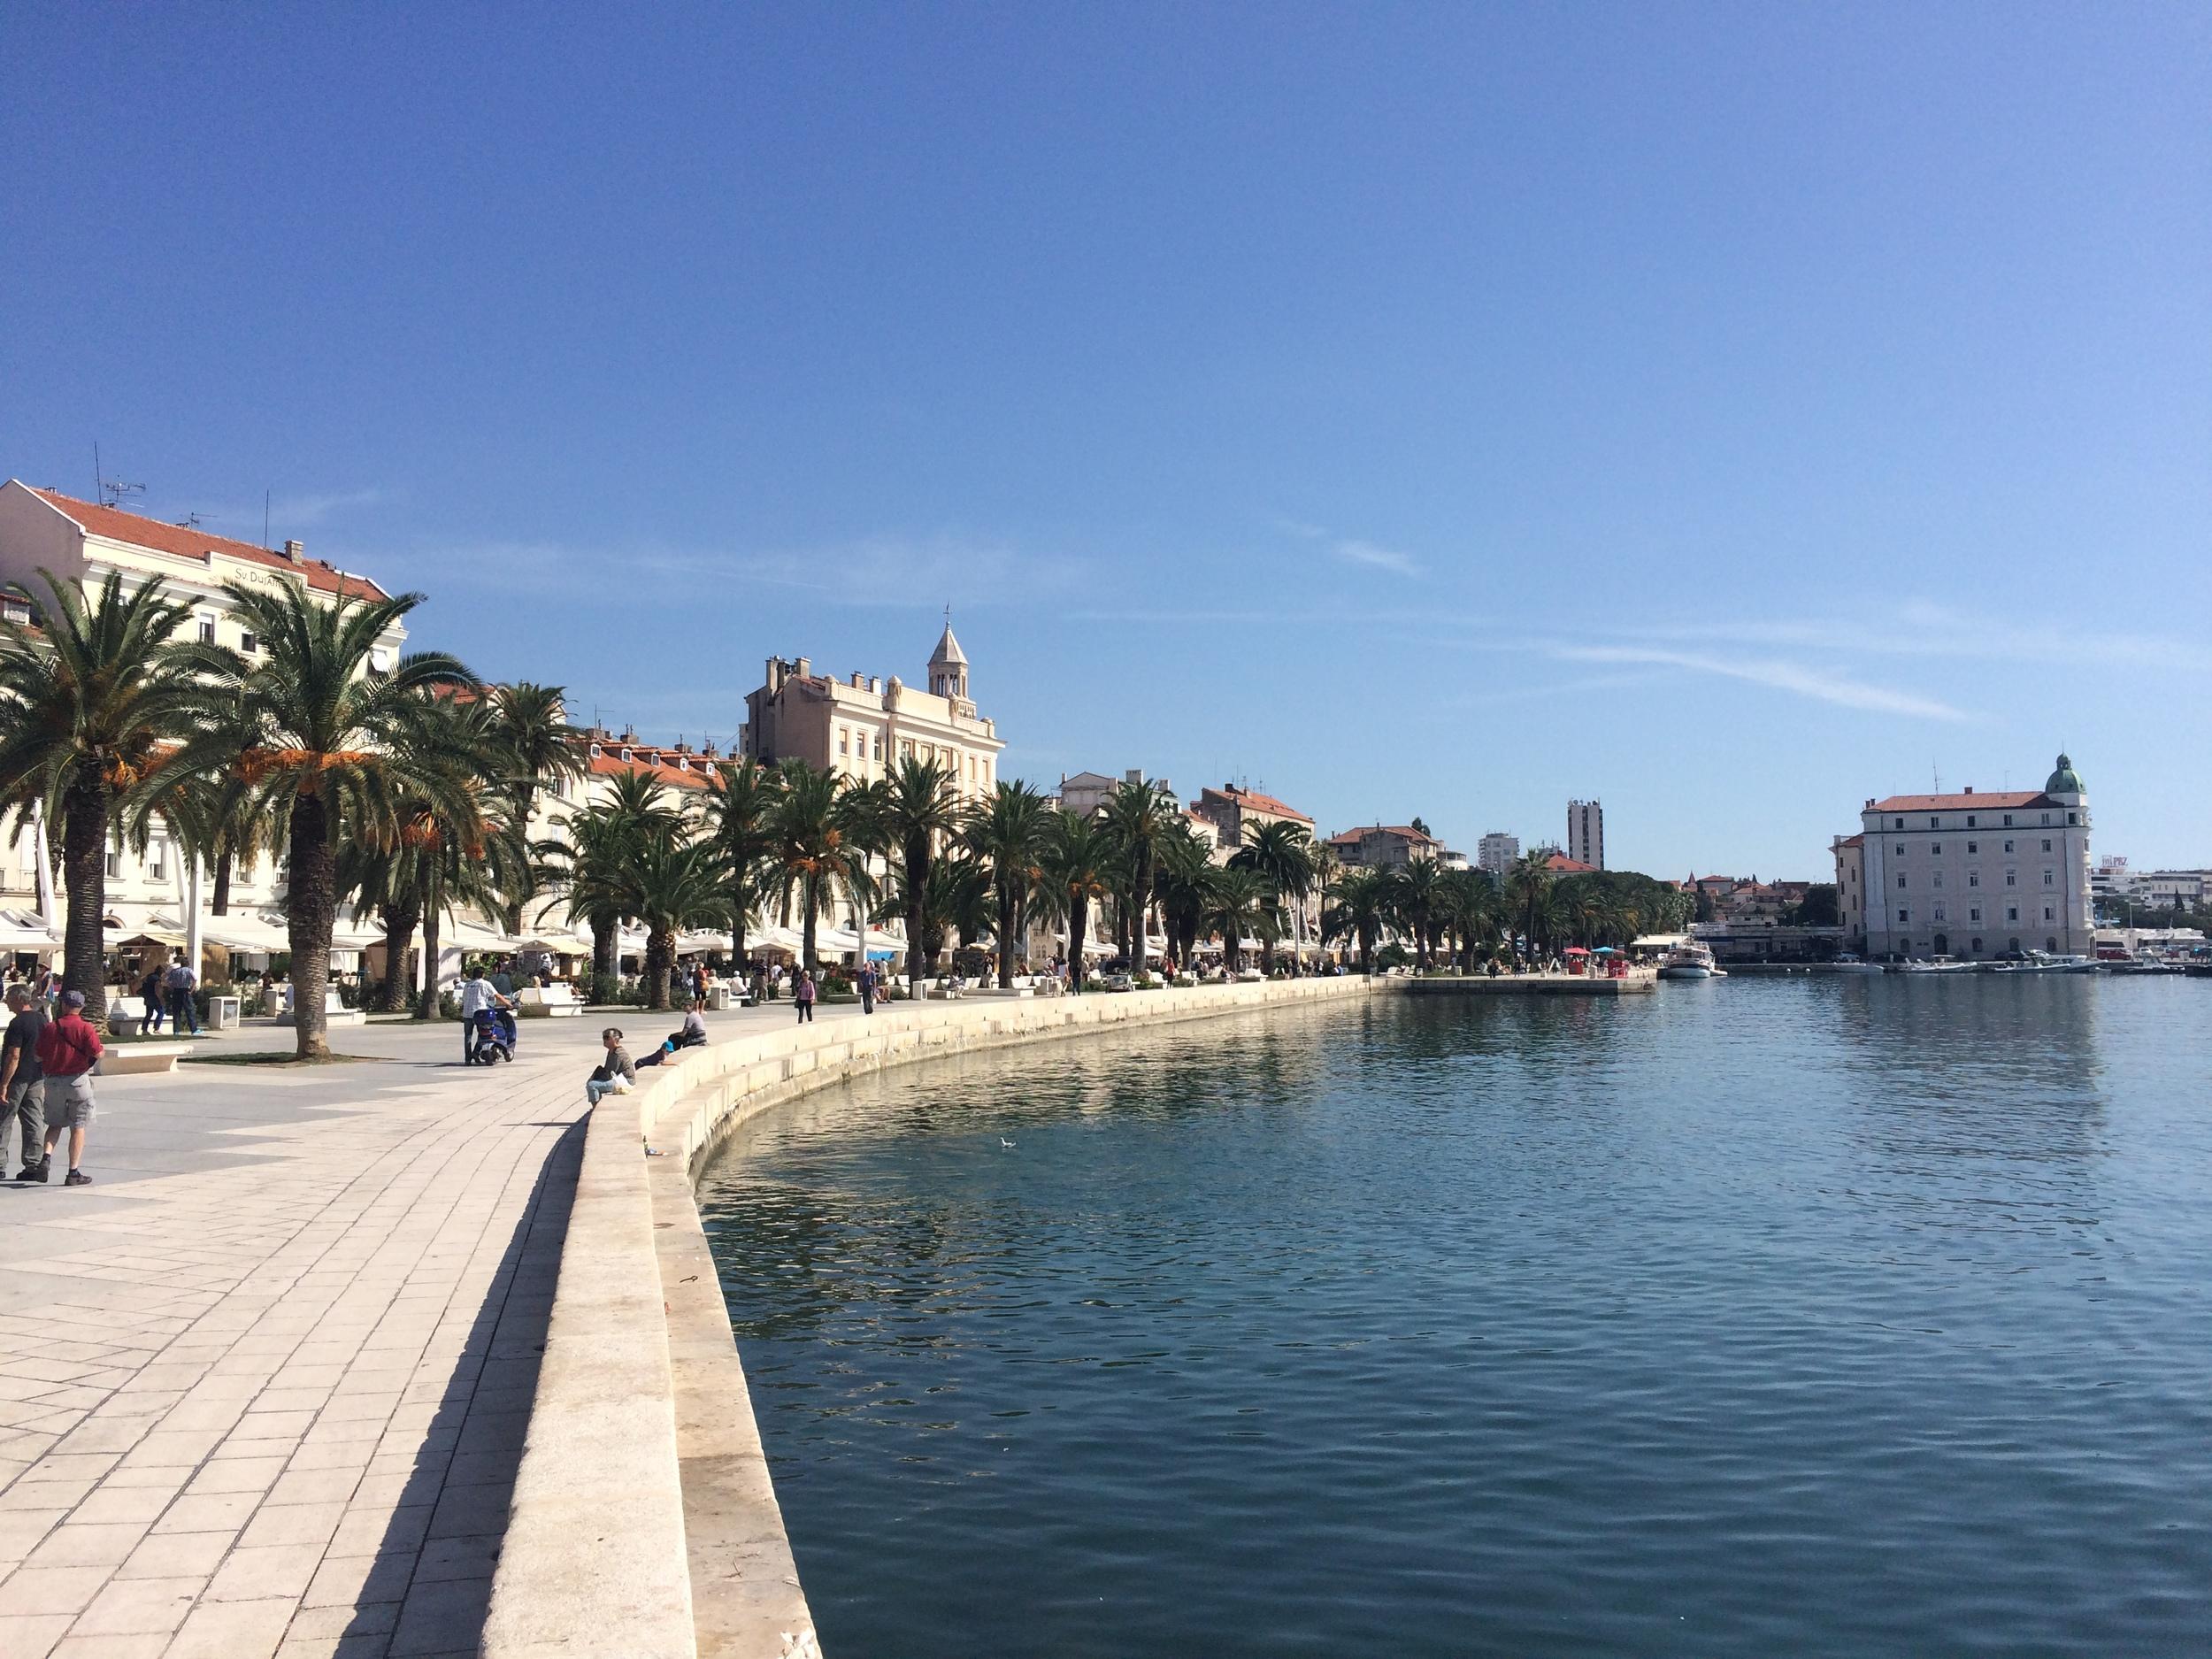 The main promenade along the water in Split, Croatia.